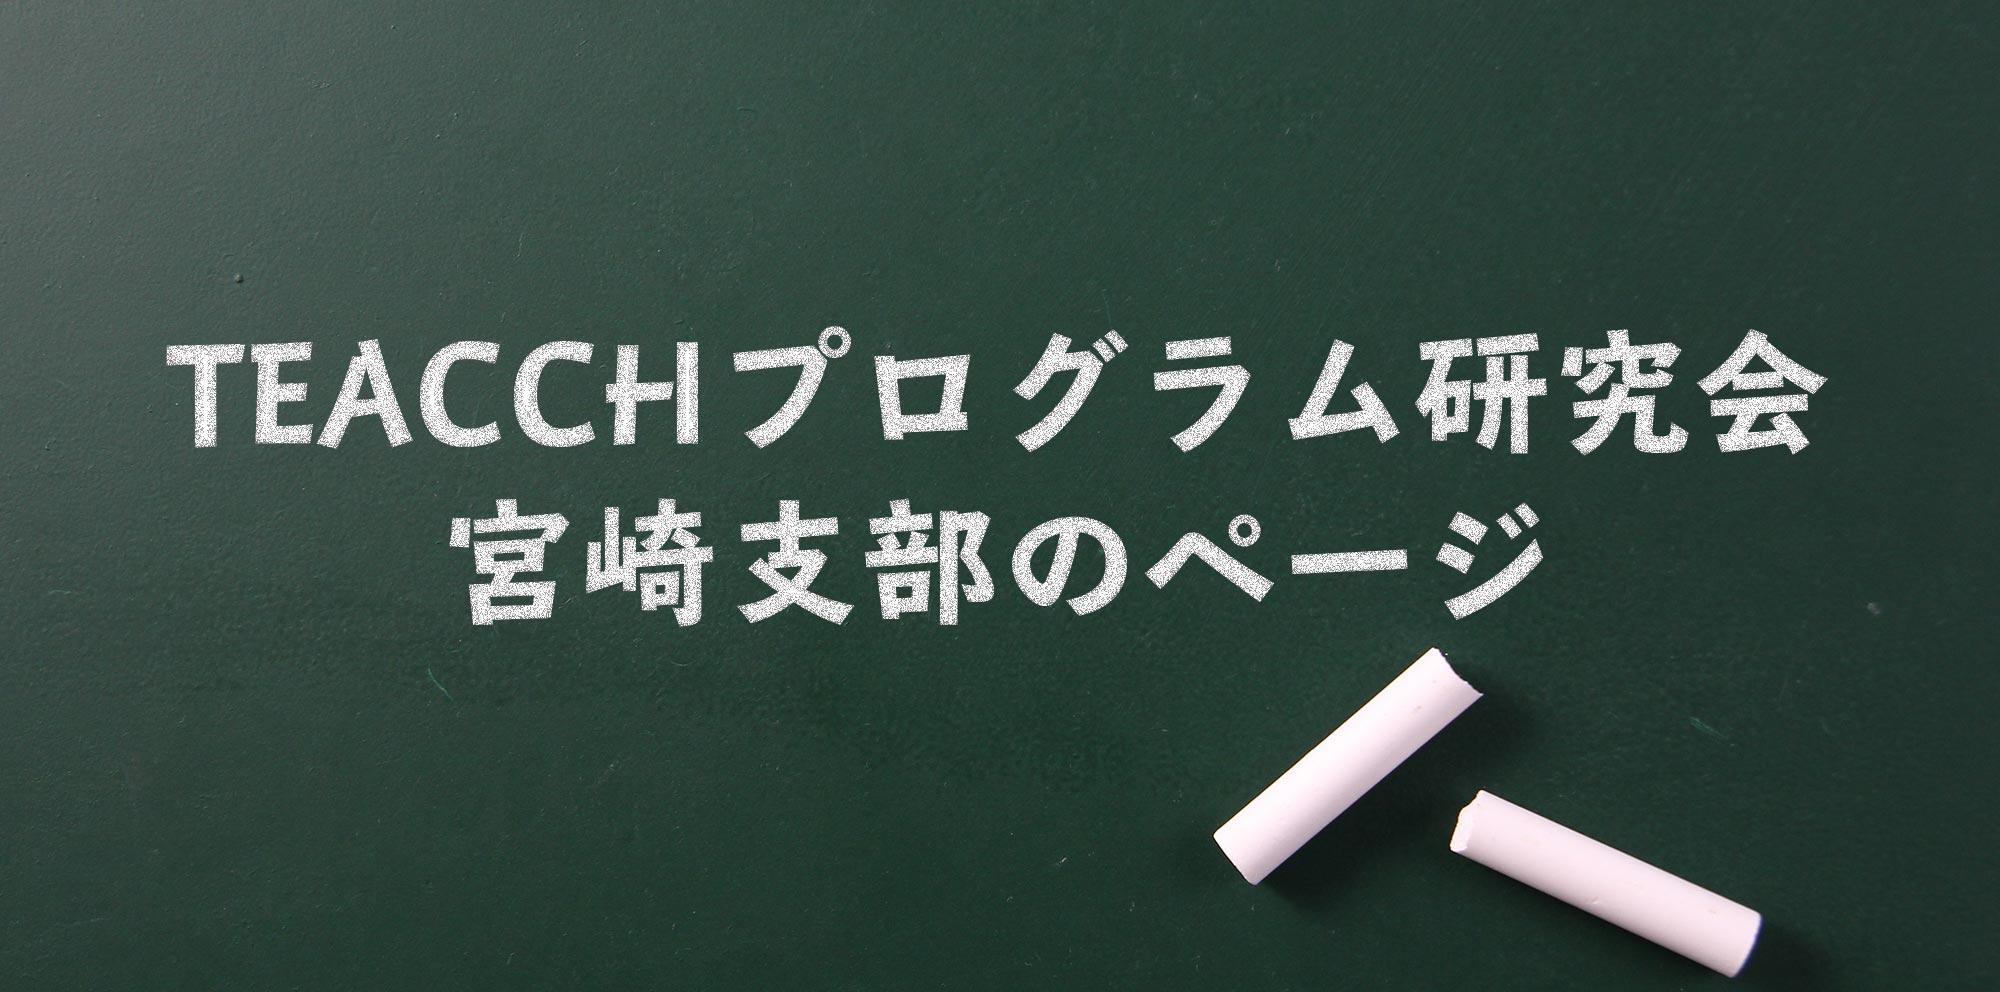 TEACCHプログラム研究会宮崎支部のページ